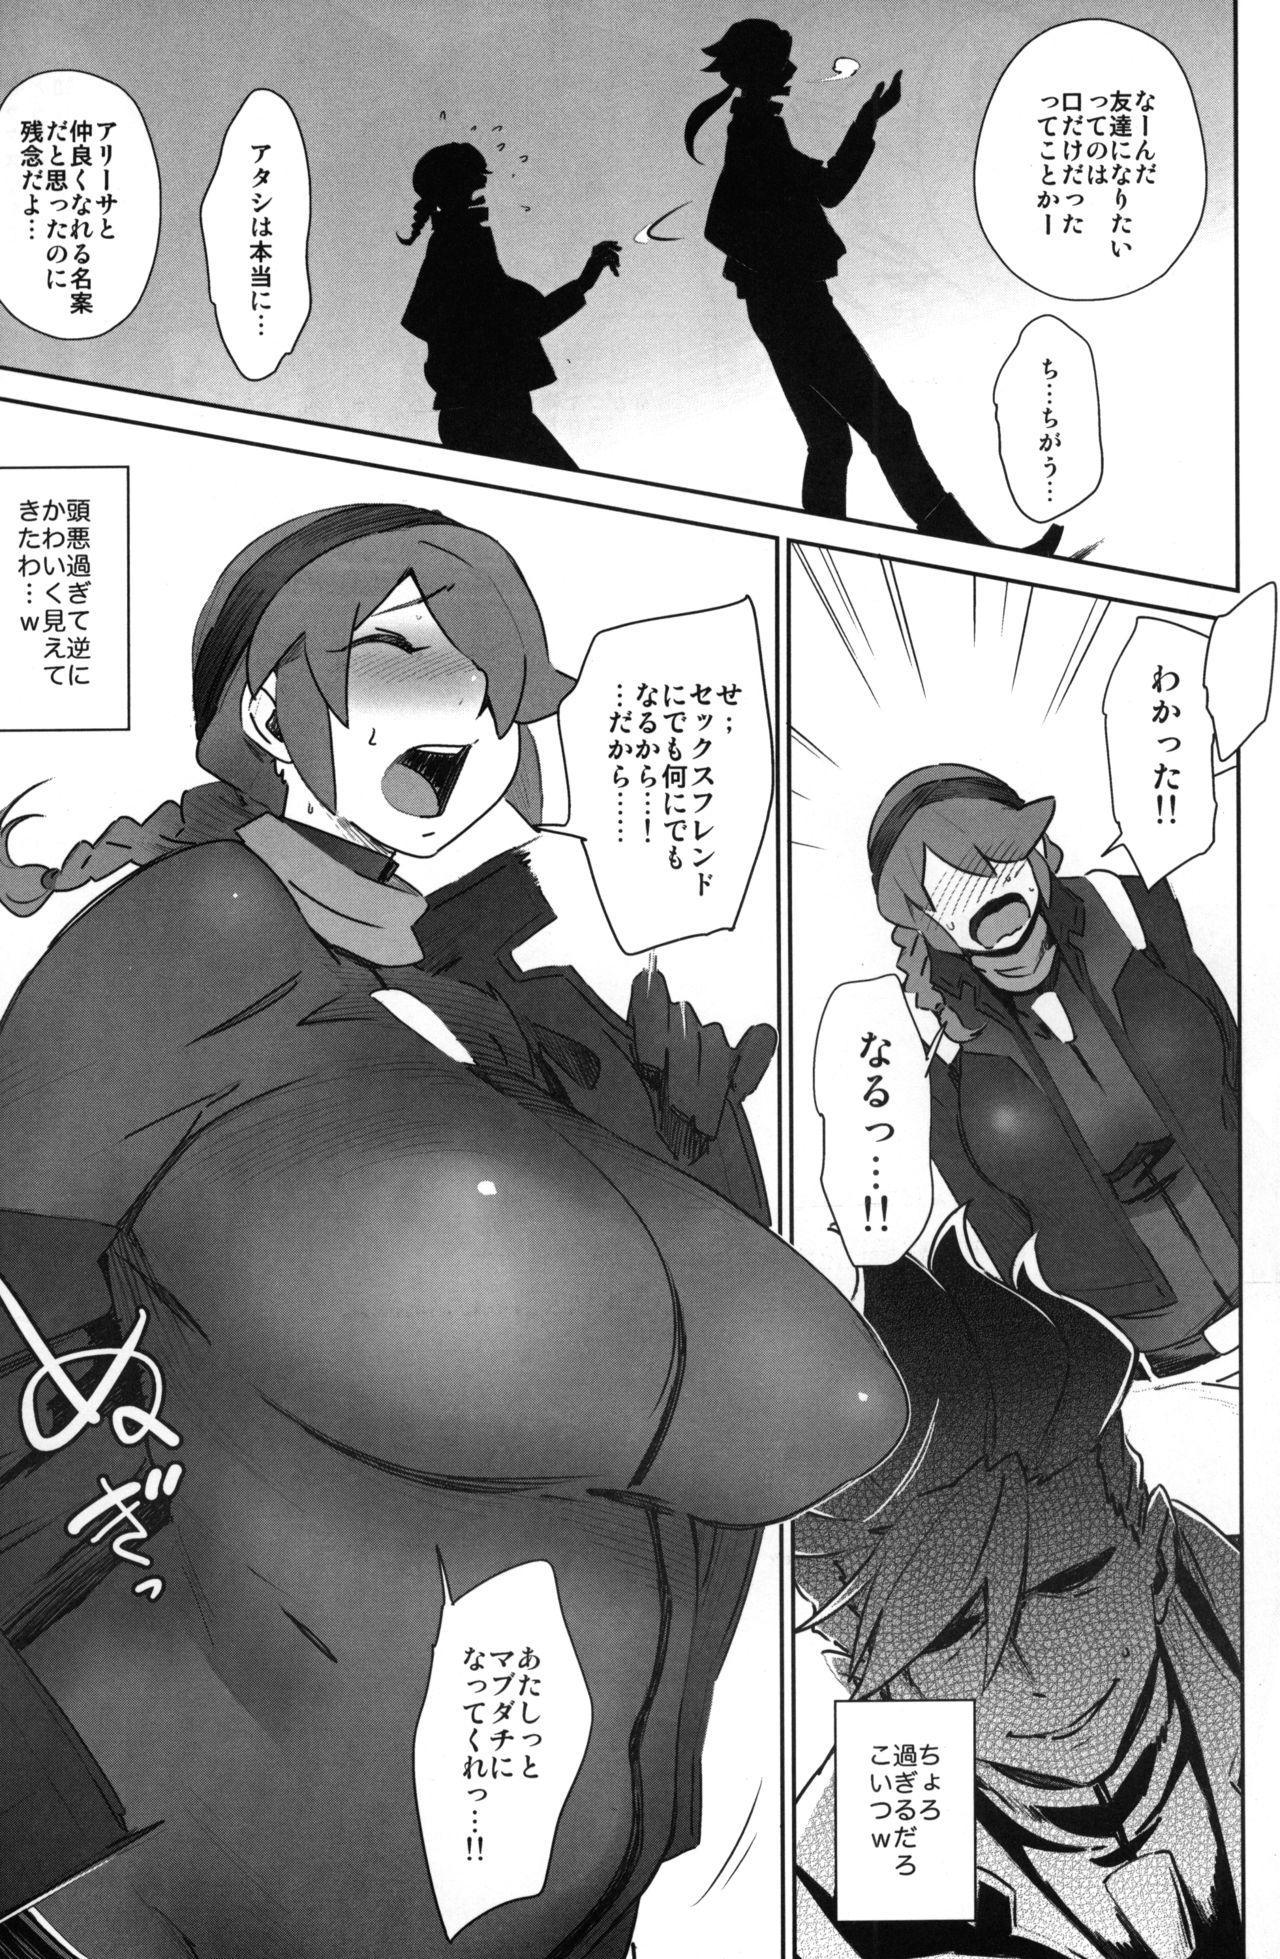 Abradeli Kamitaba No. 11 Otona no GundamAge 2 seX-rounder 3